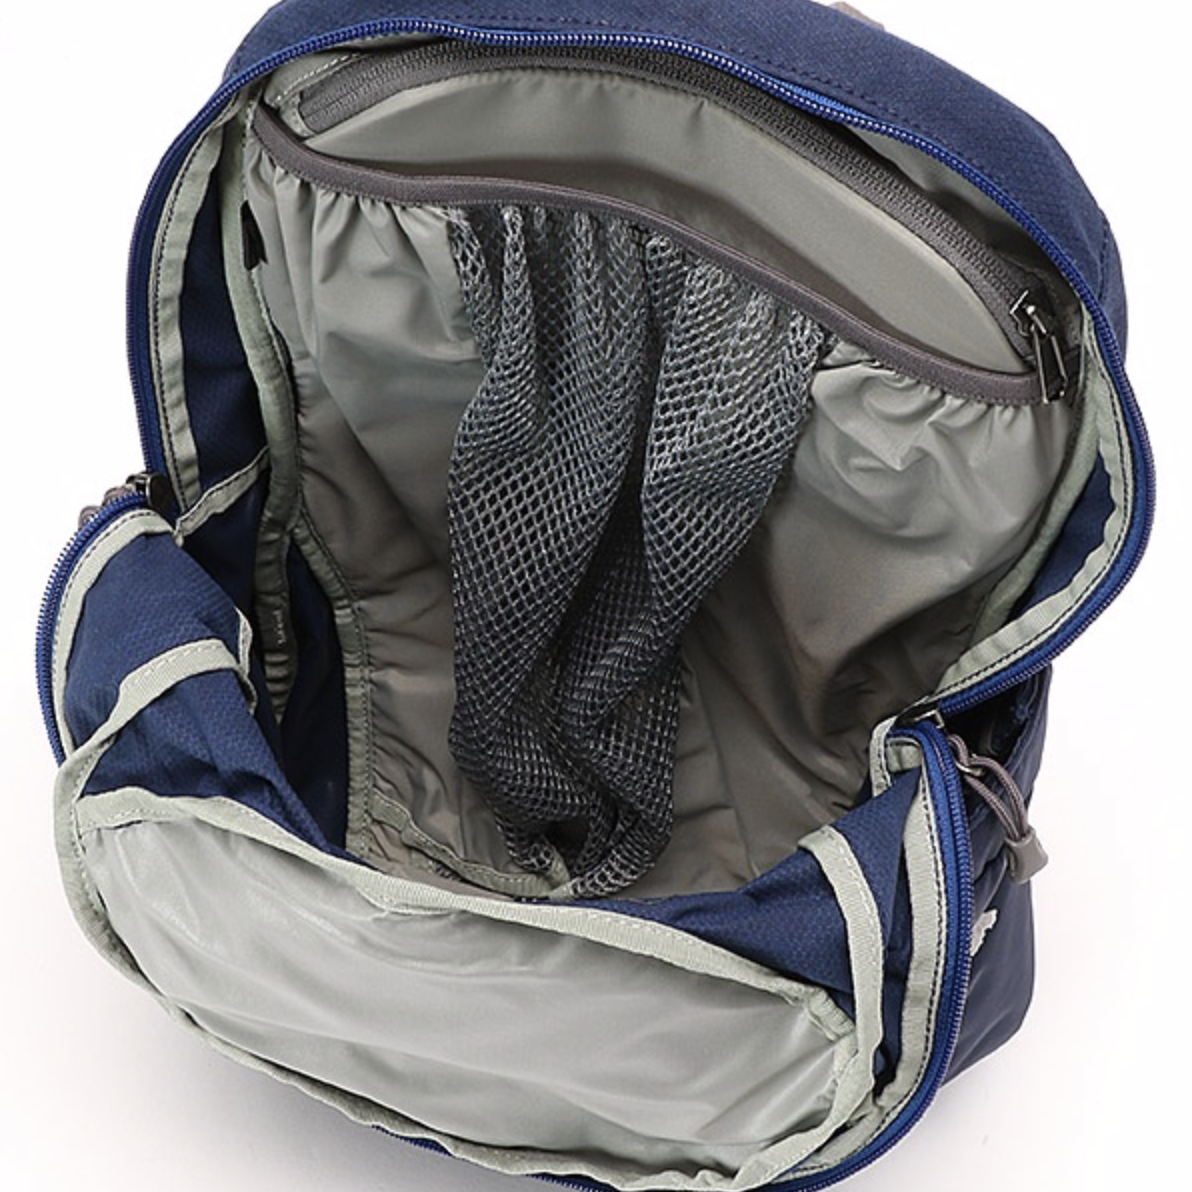 f:id:thebackpack:20191007181439p:plain